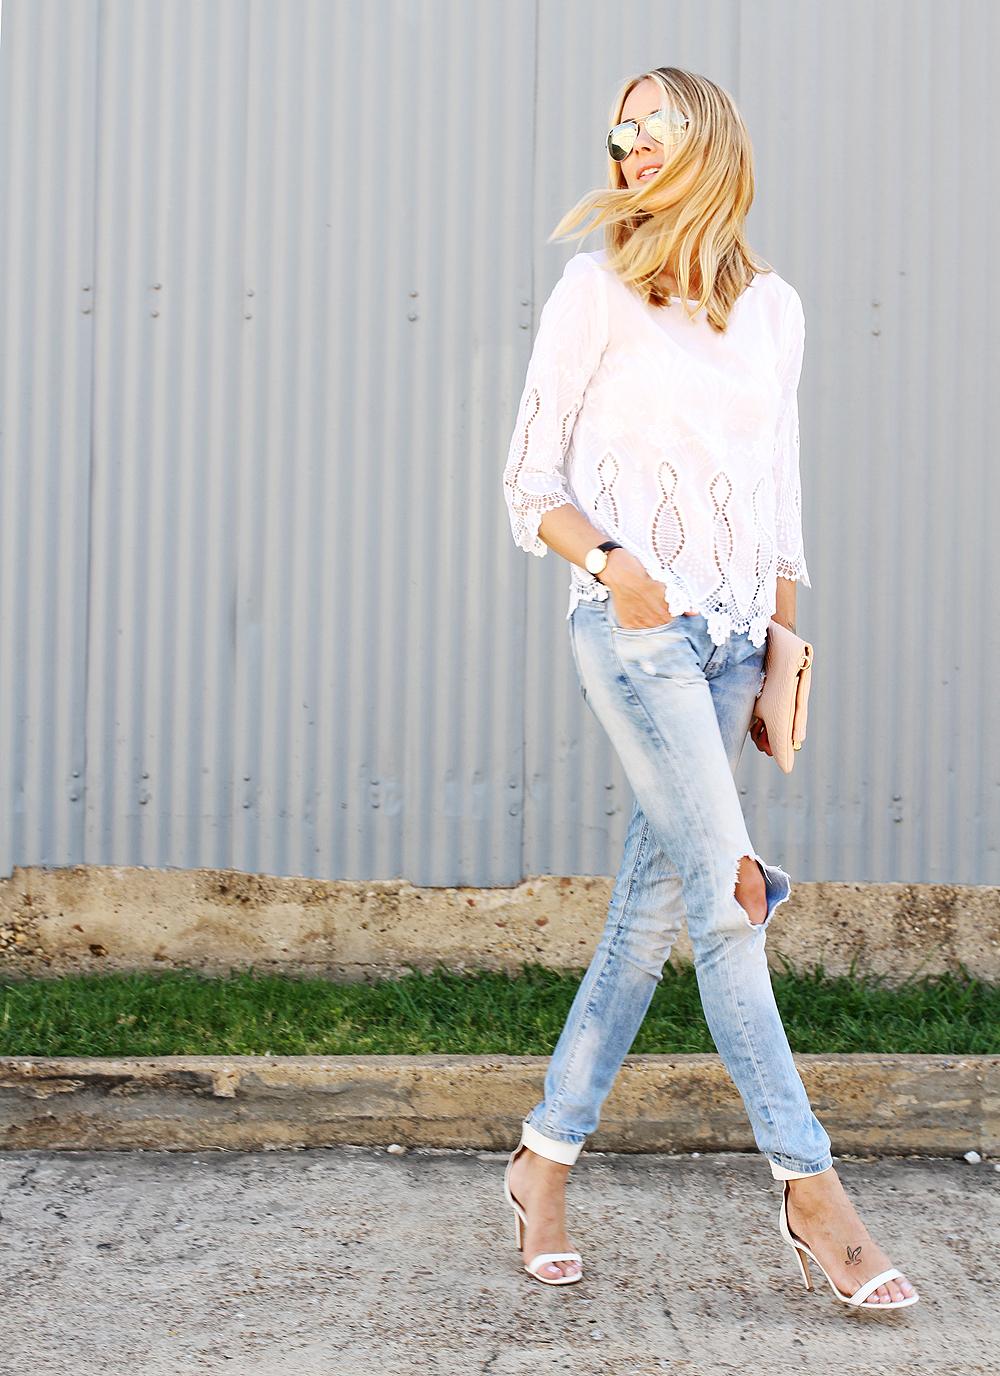 7b46a0ff4f9 banana-republic-white-lace-top-zara-ripped-jeans- ...